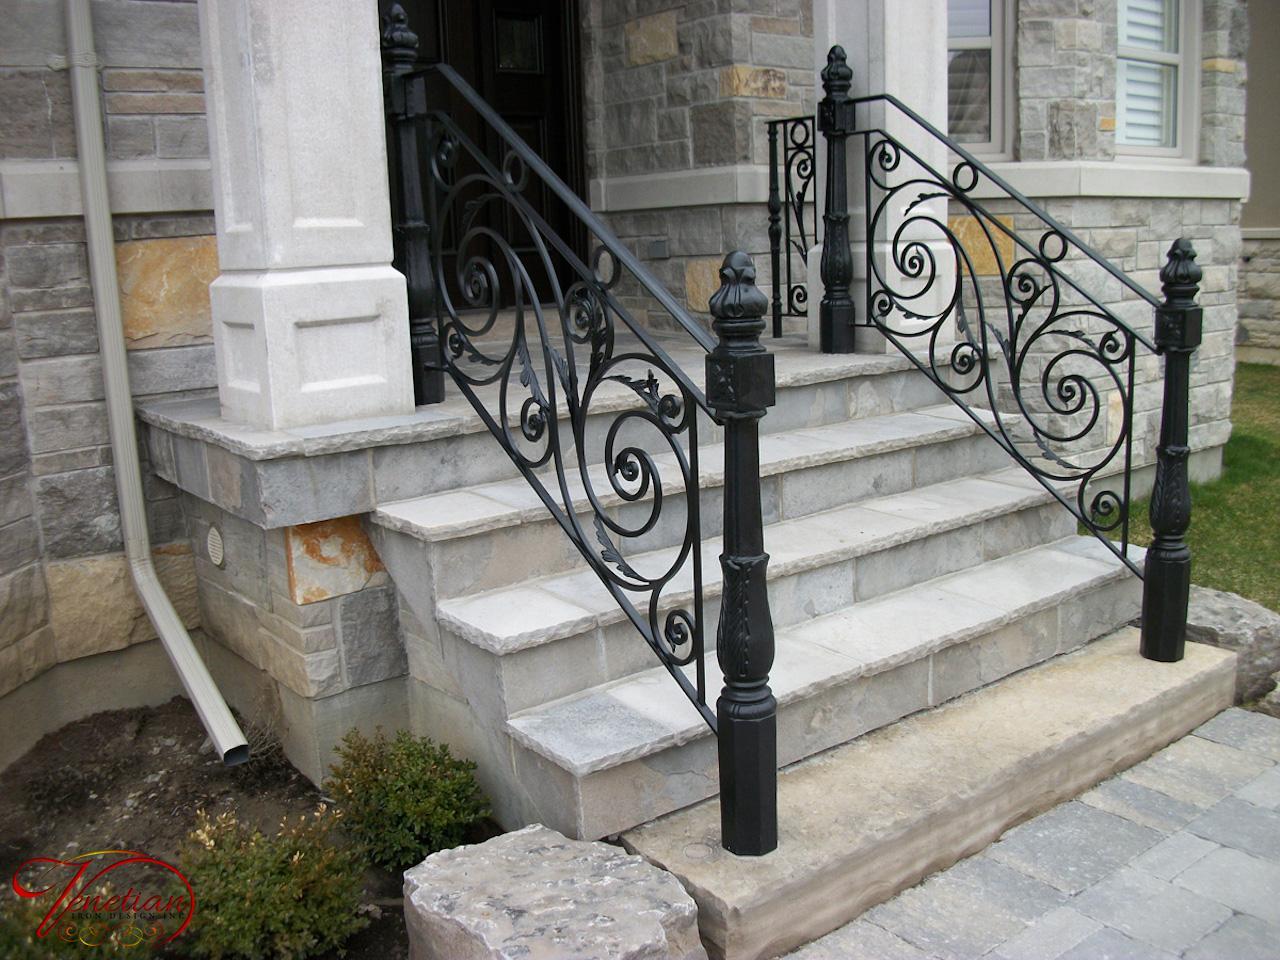 Wrought Iron Railings [exterior] - Venetian Iron Designs Inc on modern railings exterior, iron handrails exterior, steel railings exterior, stainless steel handrails exterior, wooden railings exterior, deck railings exterior, doors exterior,